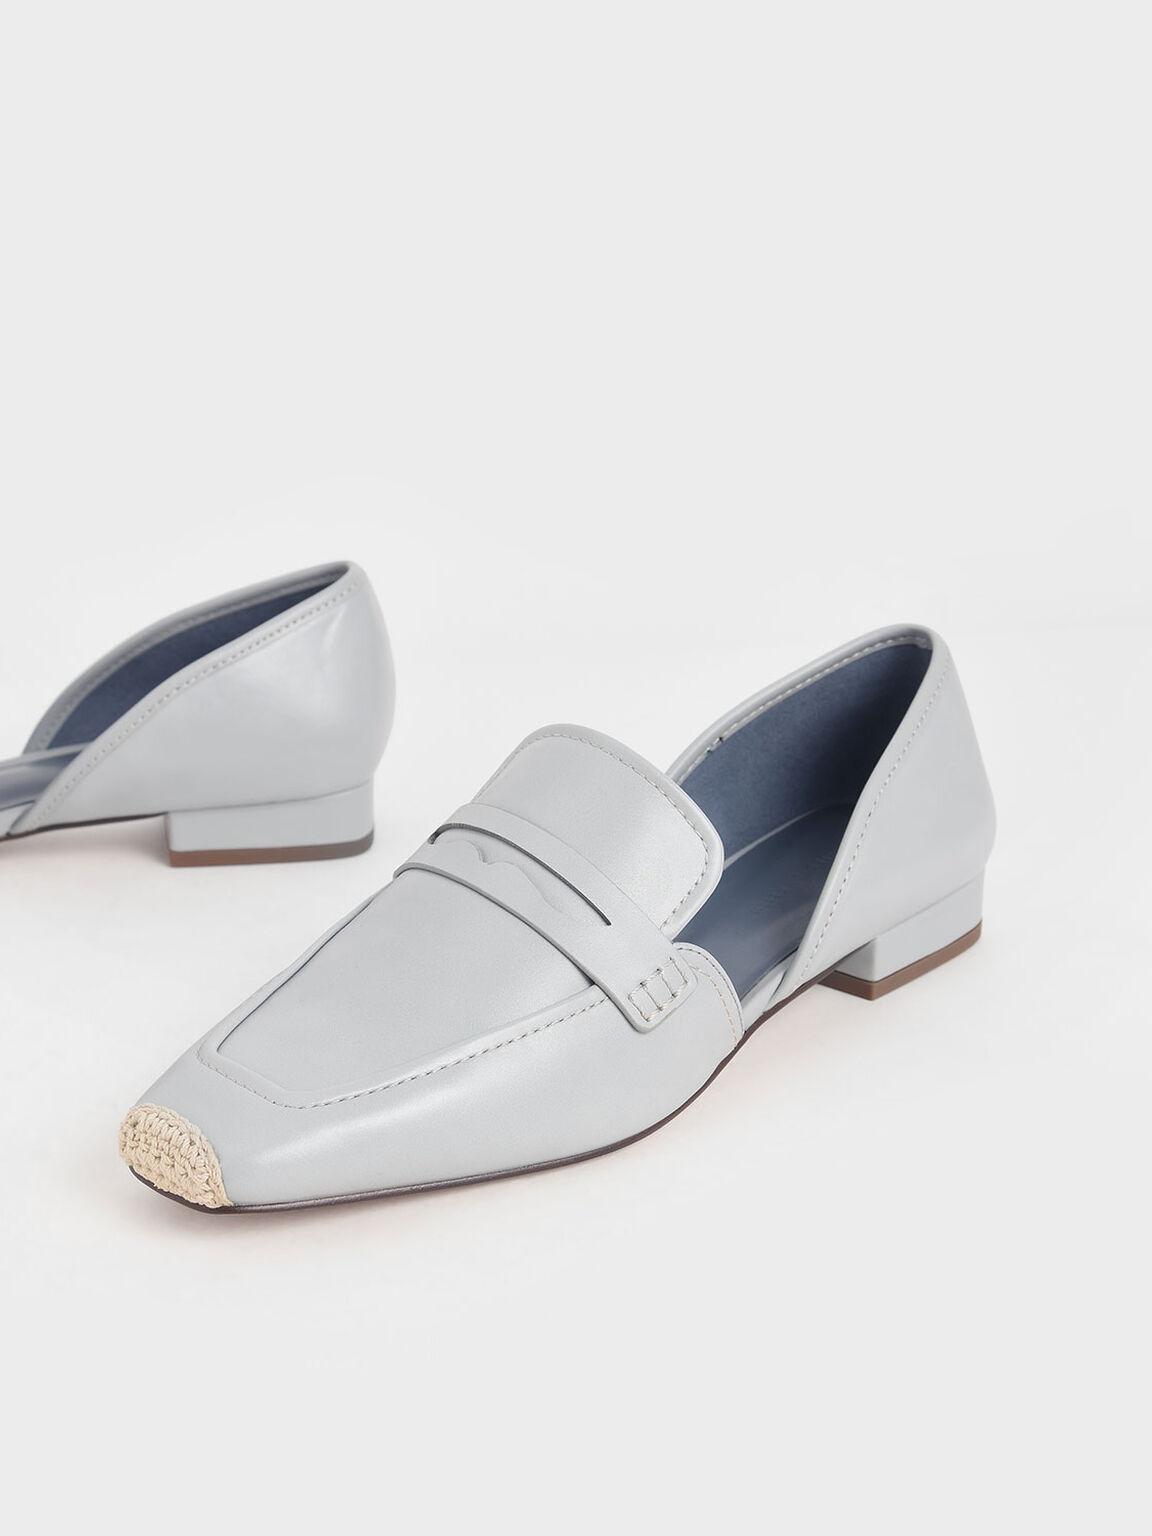 Espadrille Toe Cap Penny Loafers, Light Blue, hi-res